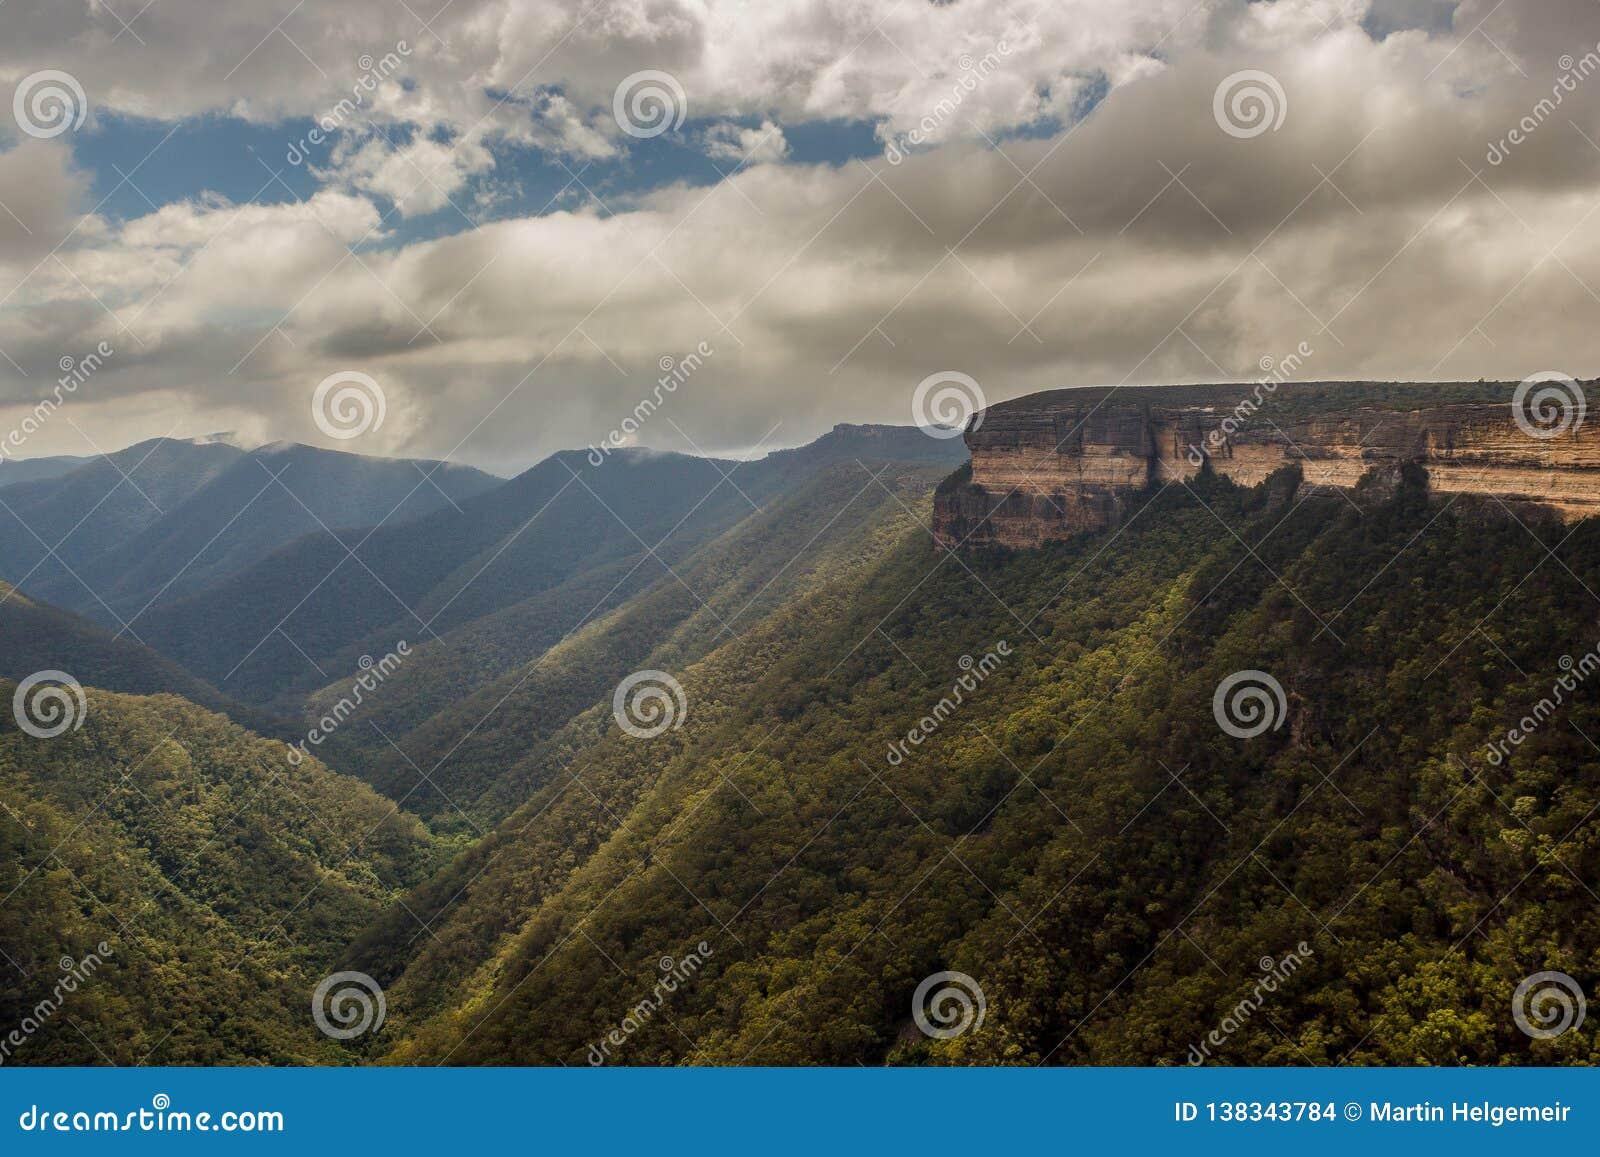 View of the Kanangra Walls, Kanangra-Boyd National Park, Australia